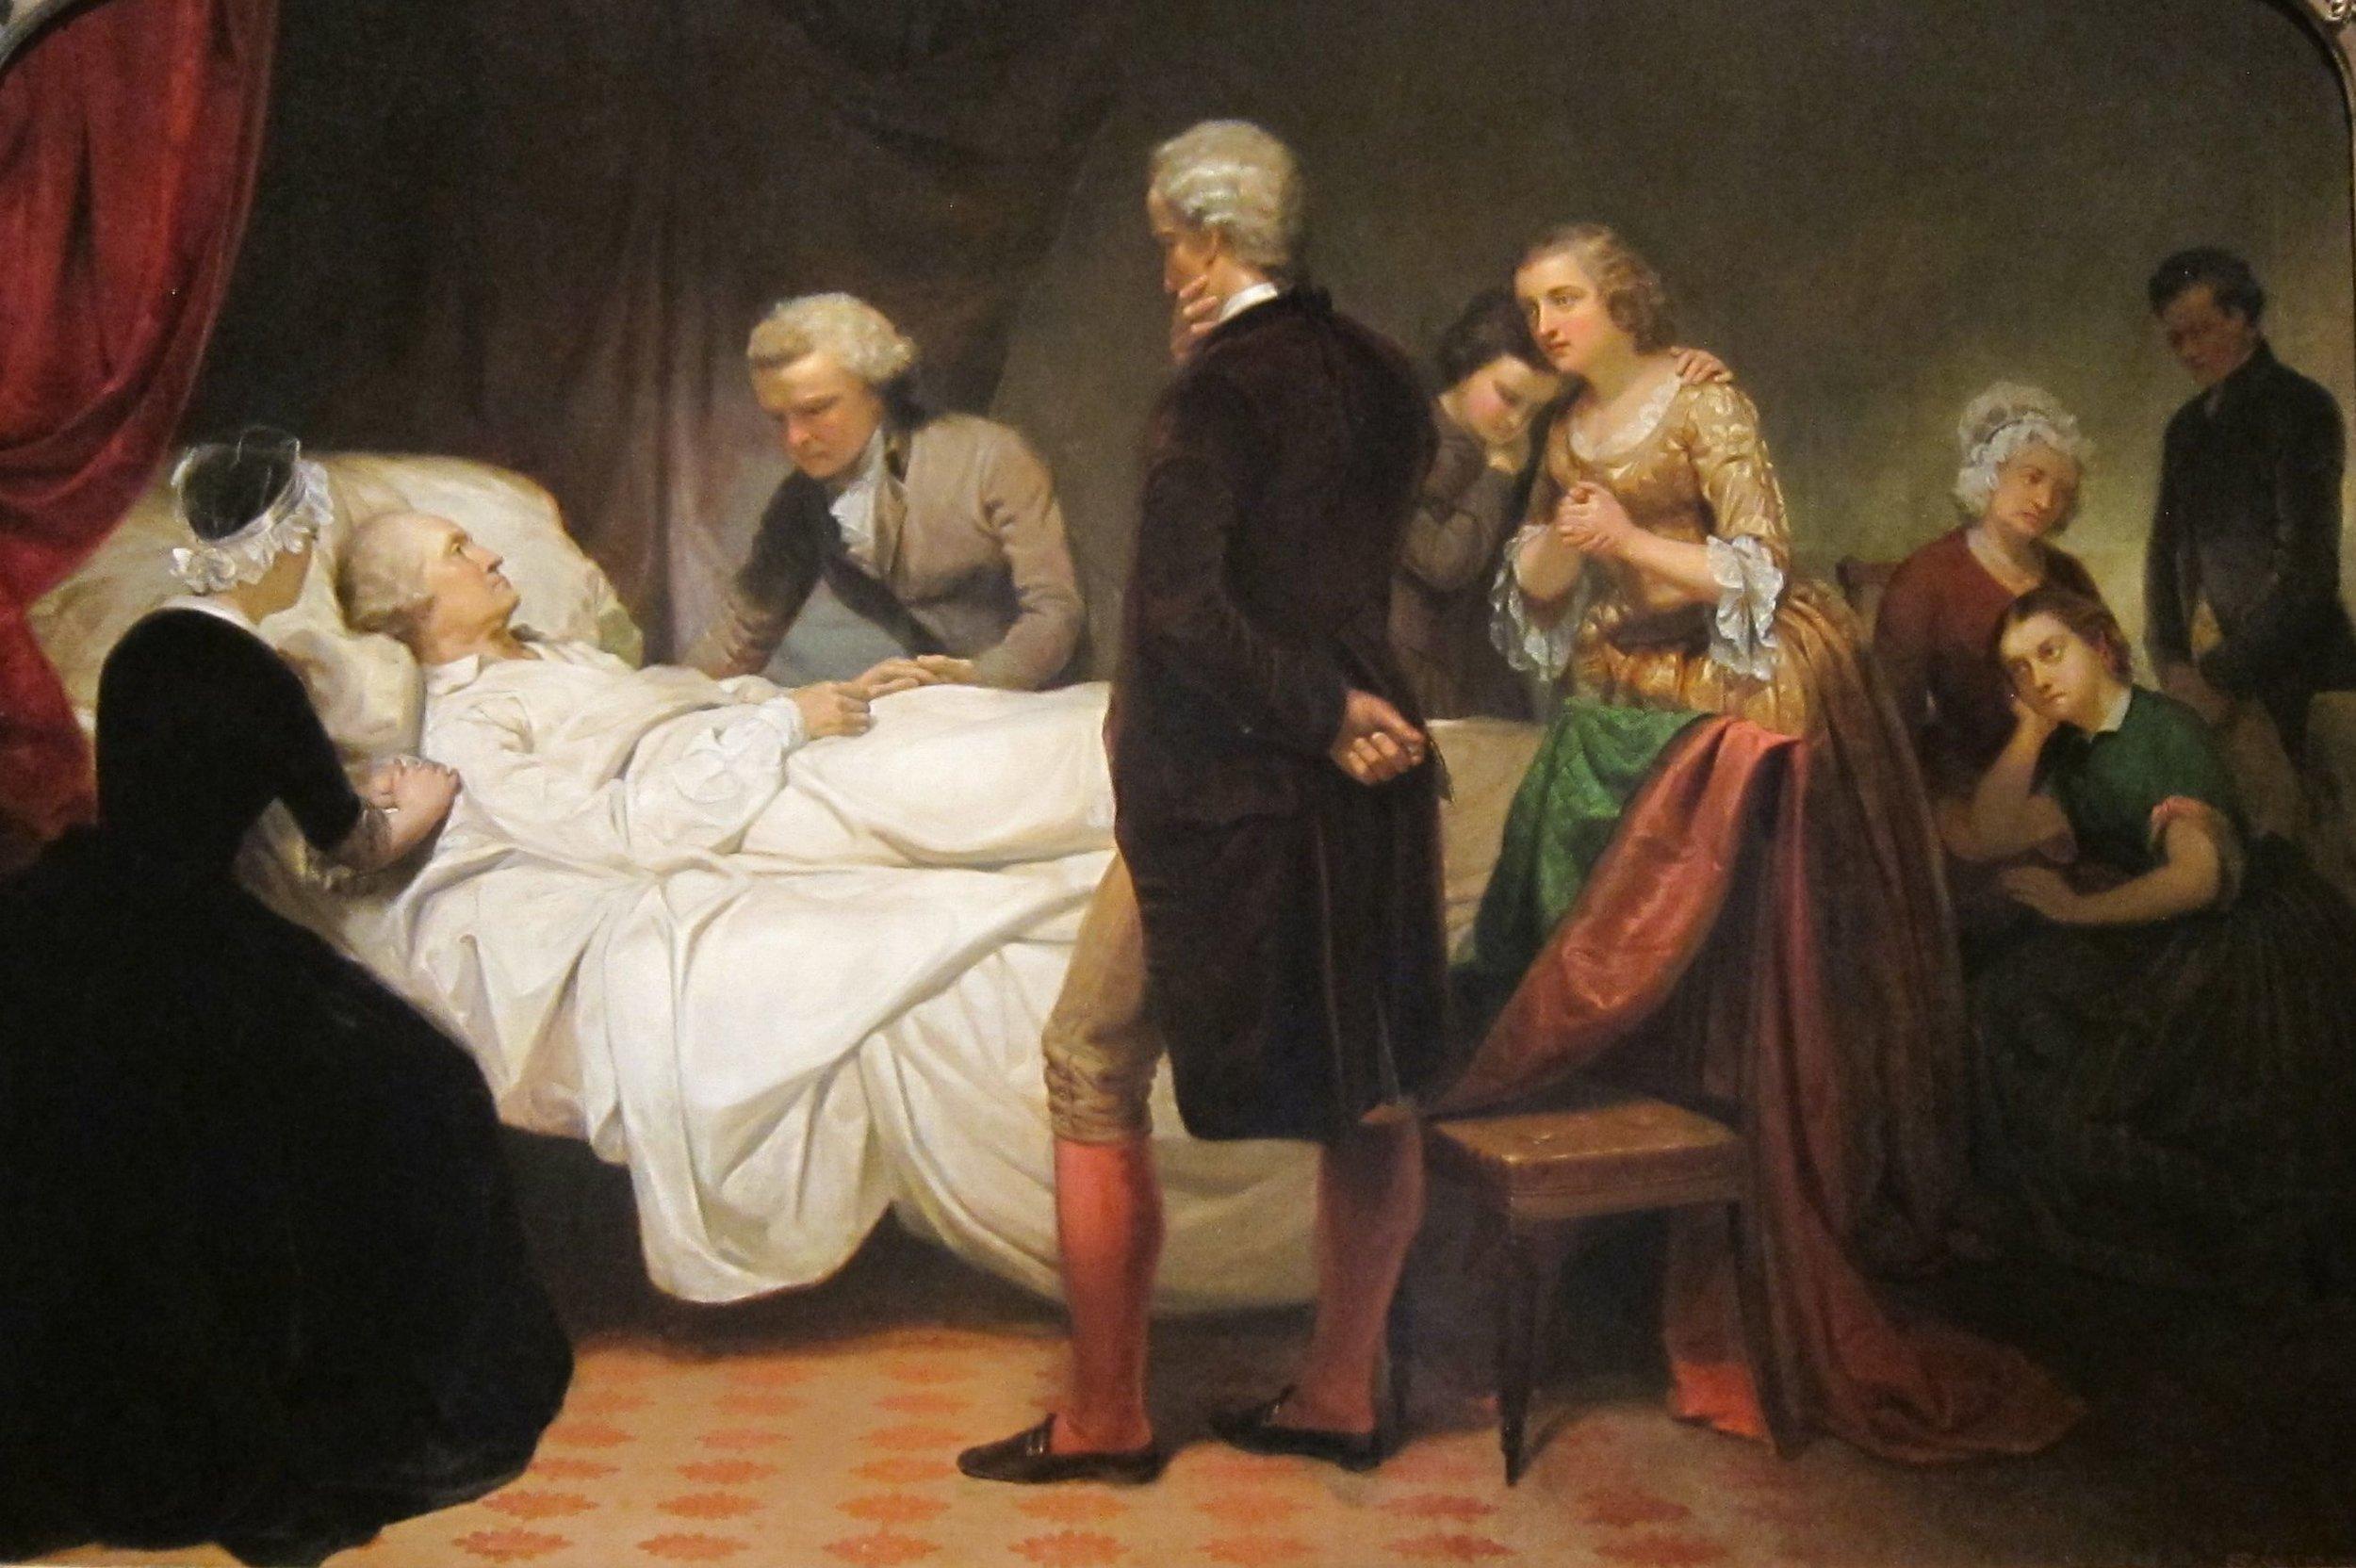 Life_of_George_Washington_Deathbed-e1445911206453.jpg